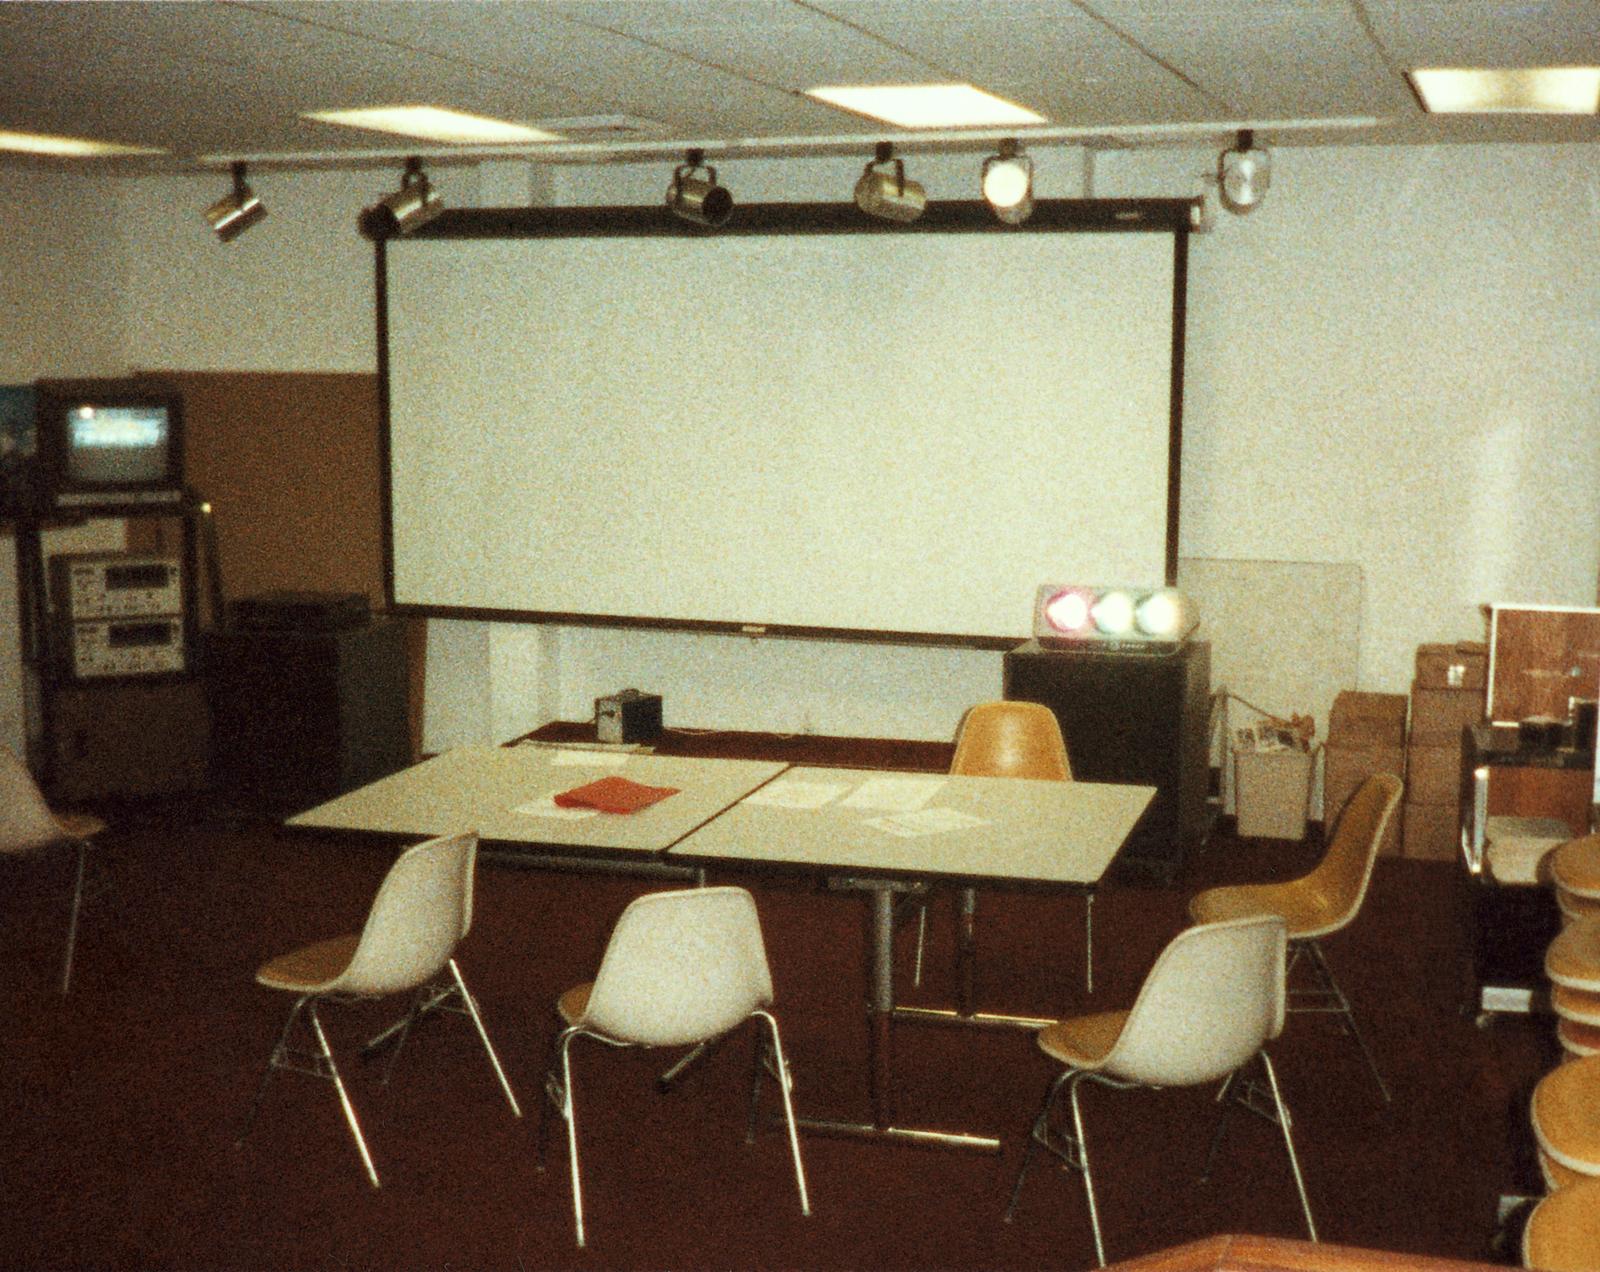 Libreville - Annex Office Building - 1986